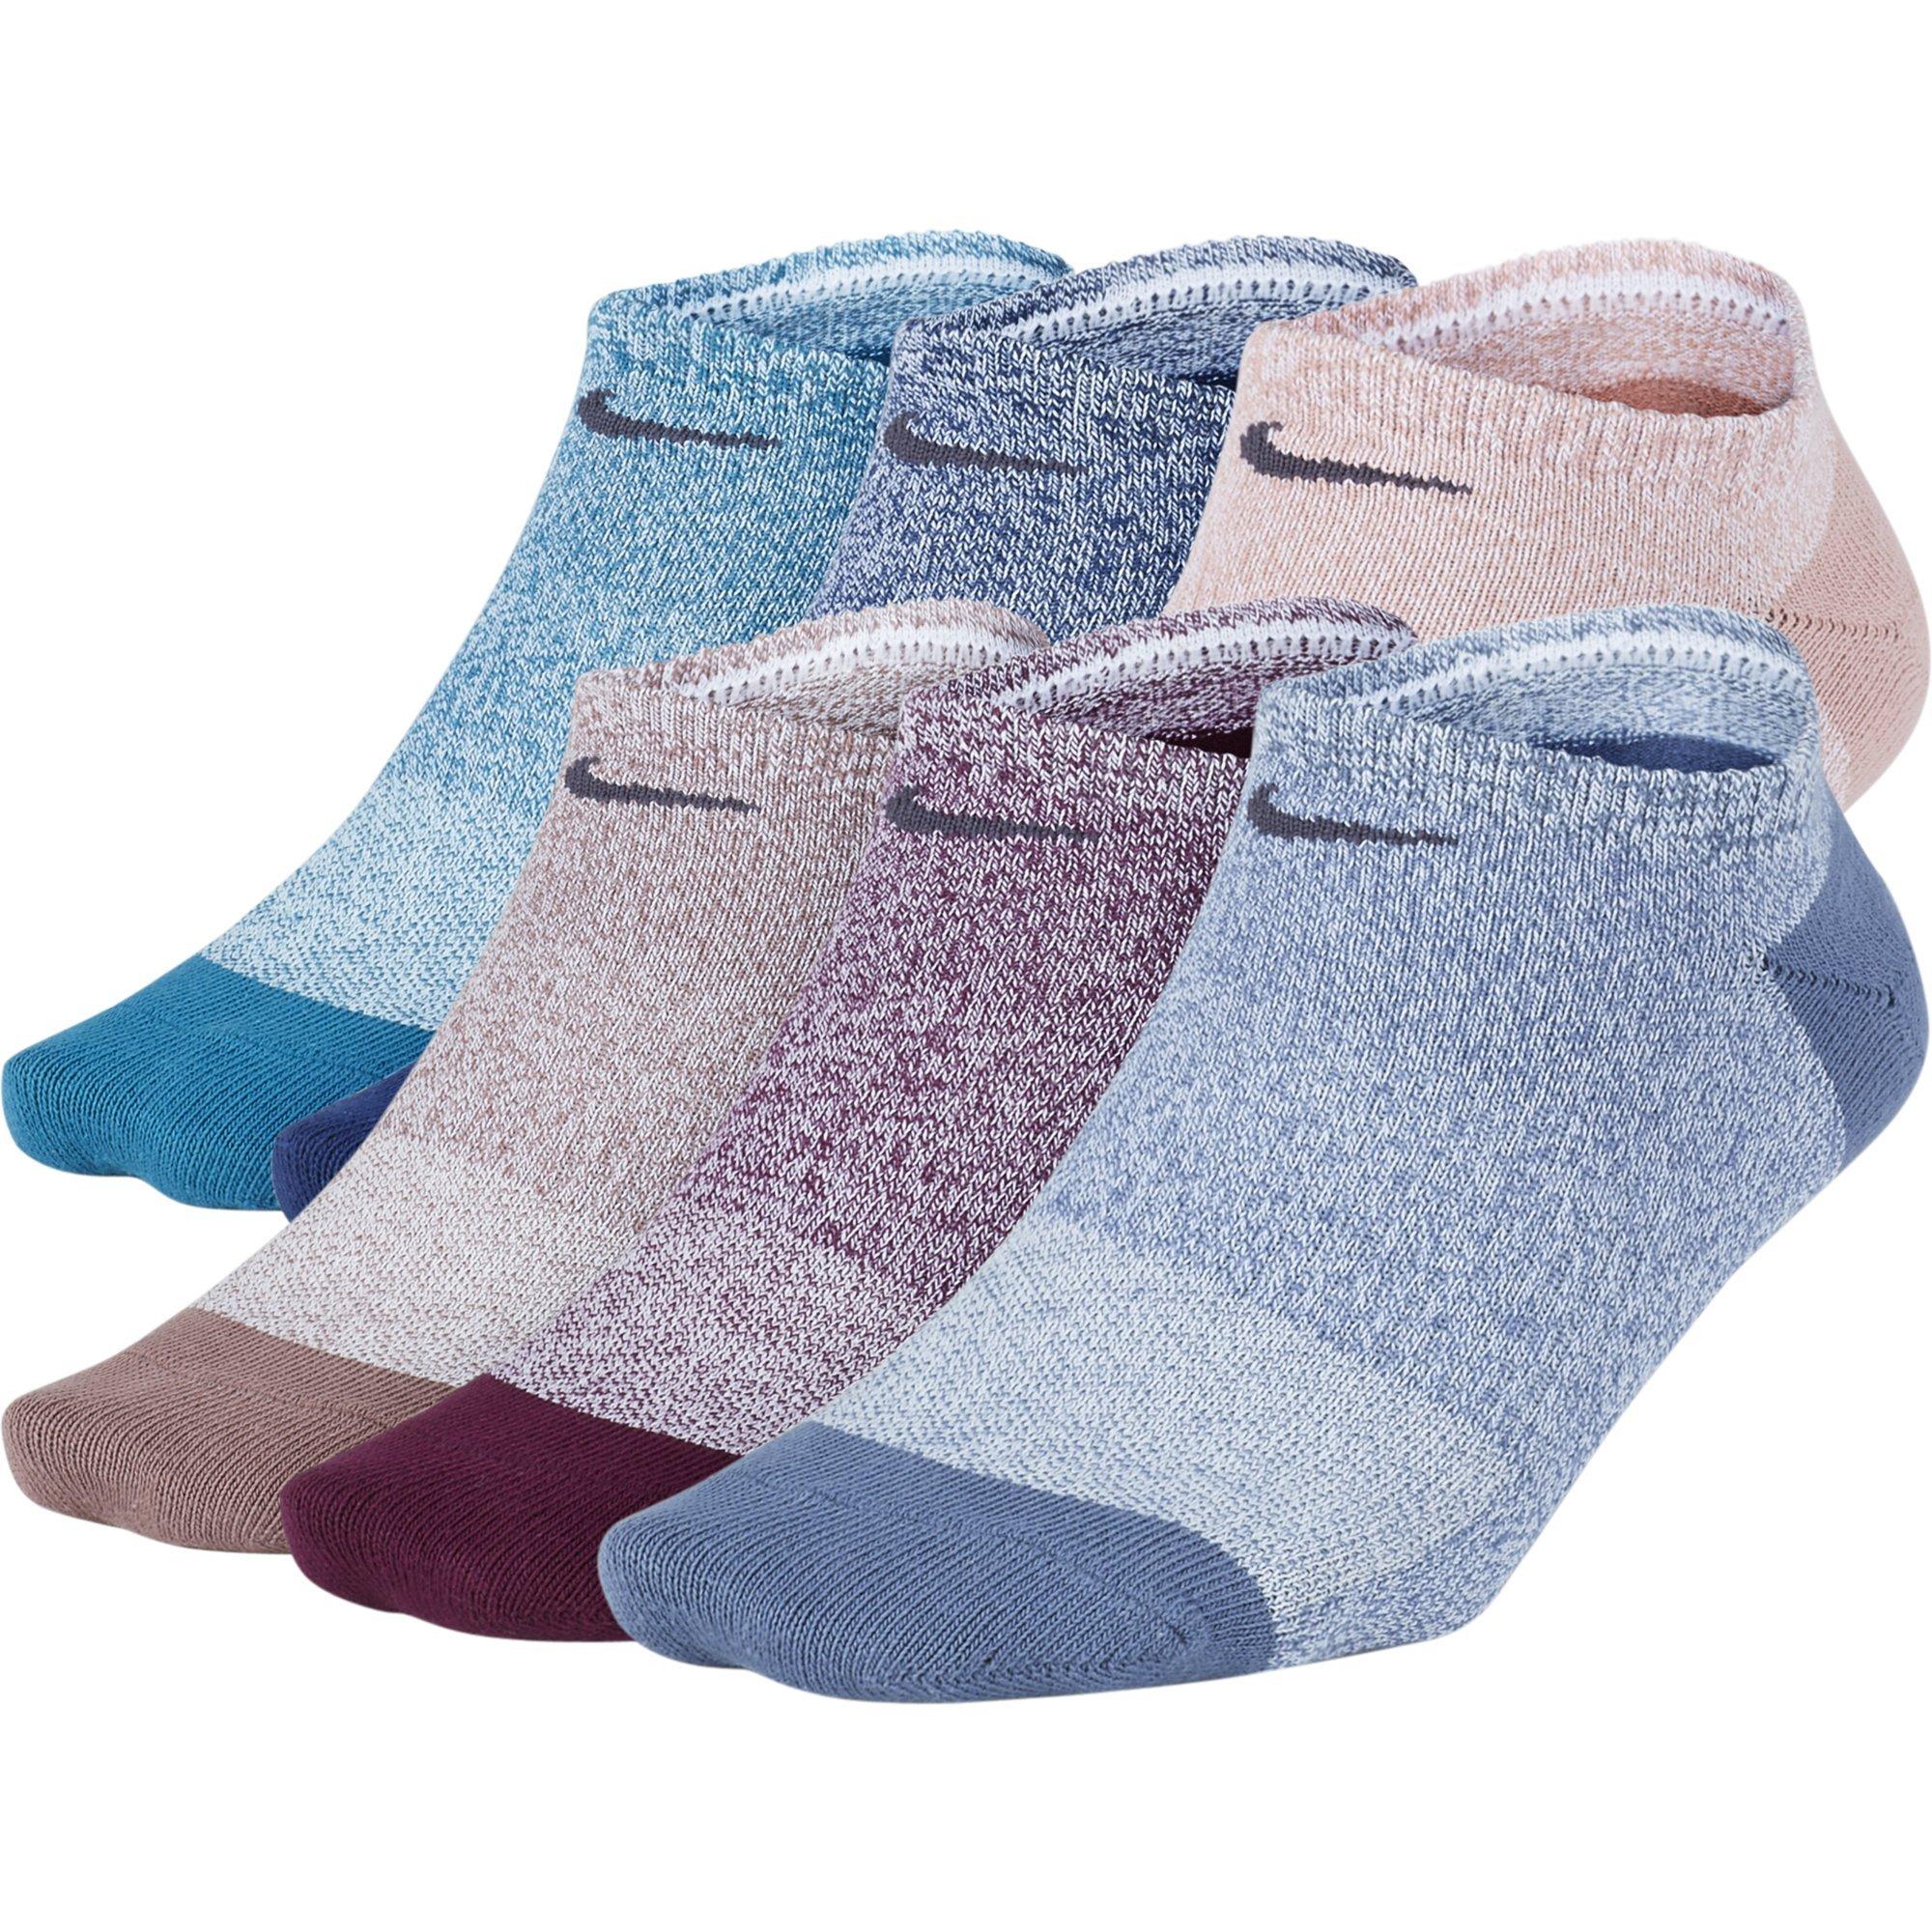 NIKE Women's Everyday Lightweight No-Show Socks (6 Pairs), Multi-Color (903), Medium